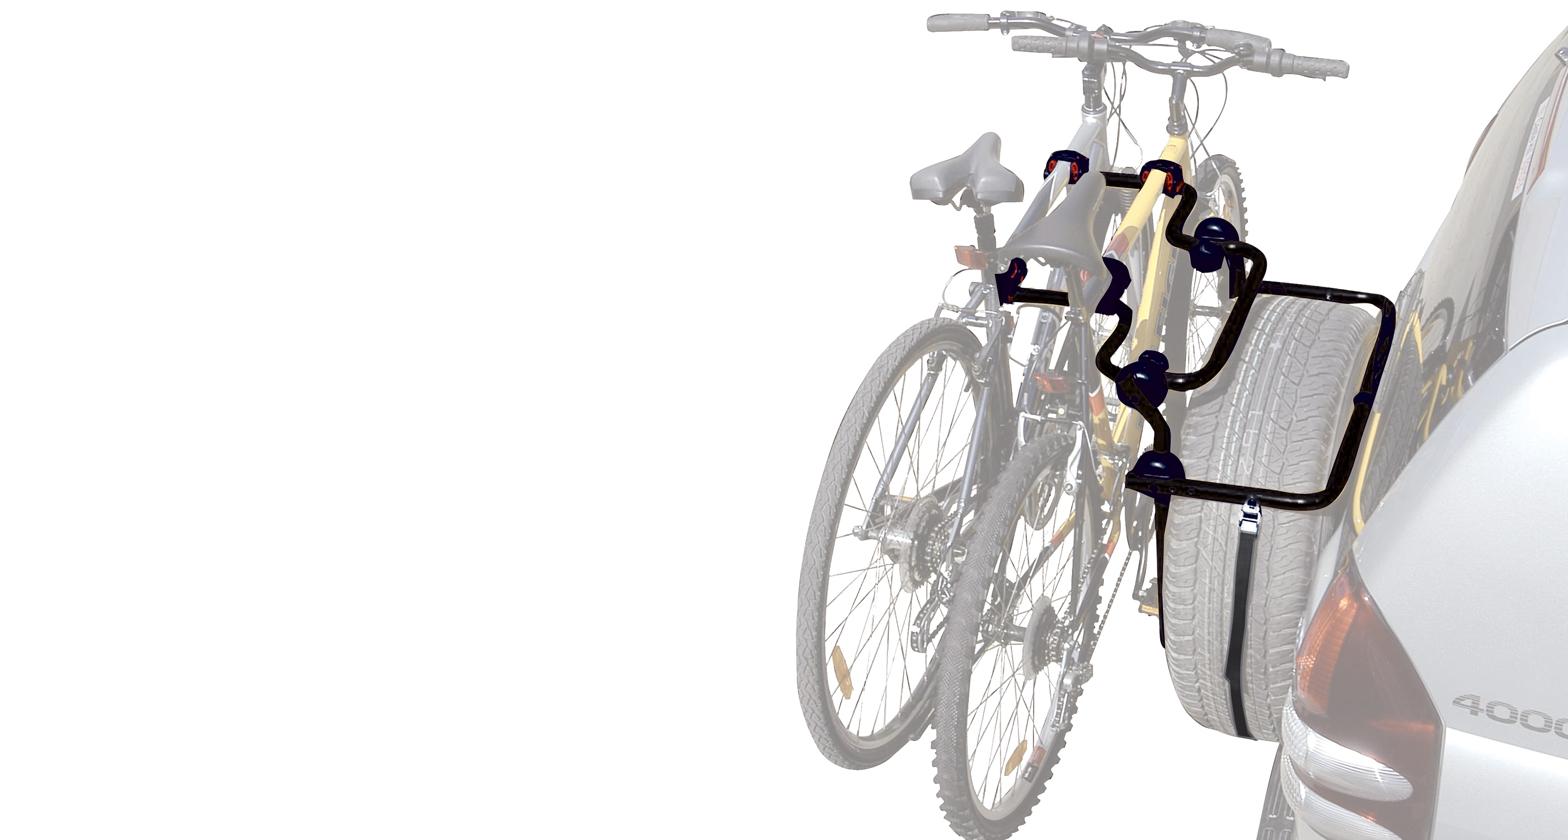 Spare Wheel Bike Carrier